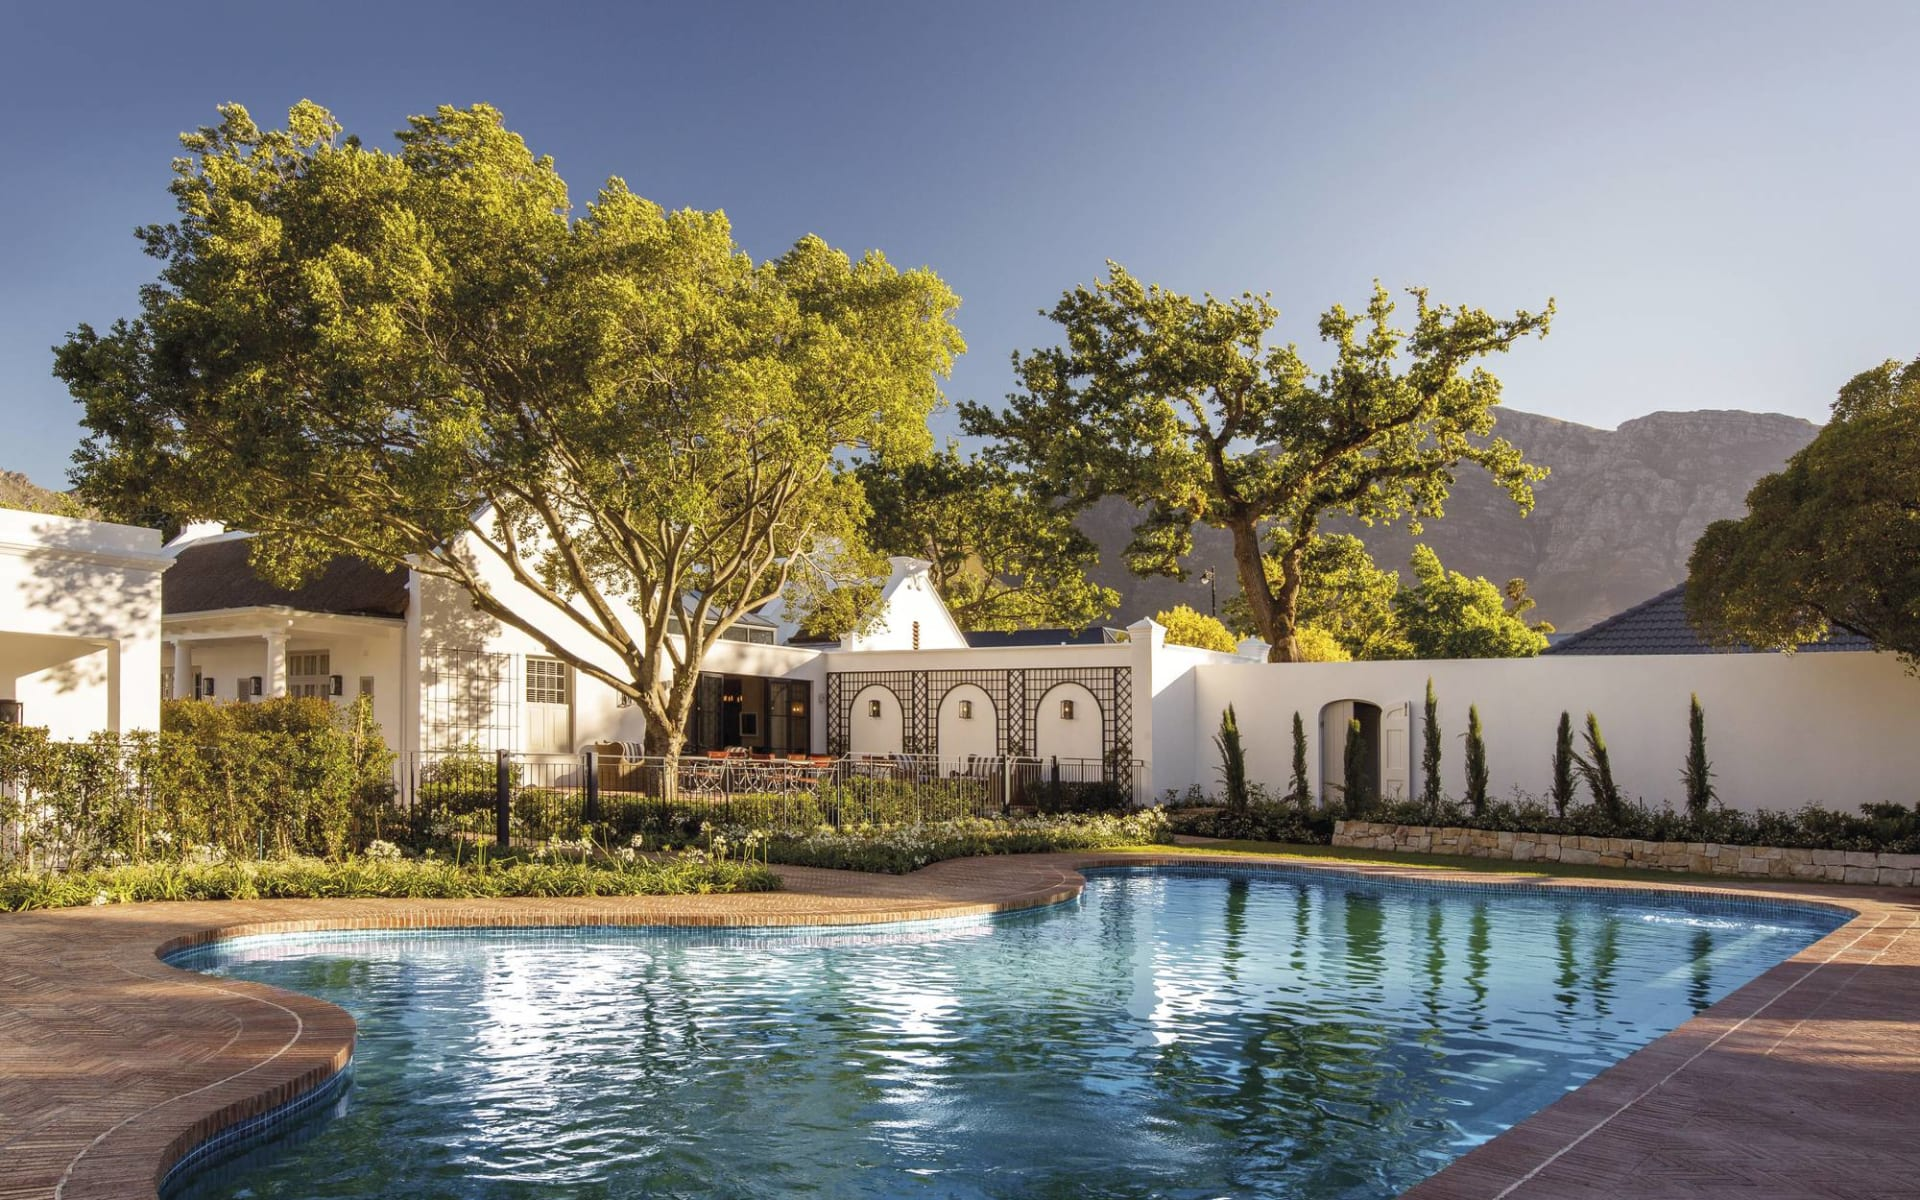 Leeu House in Franschhoek: pool Leeu House - Swimmingpool mit Garten